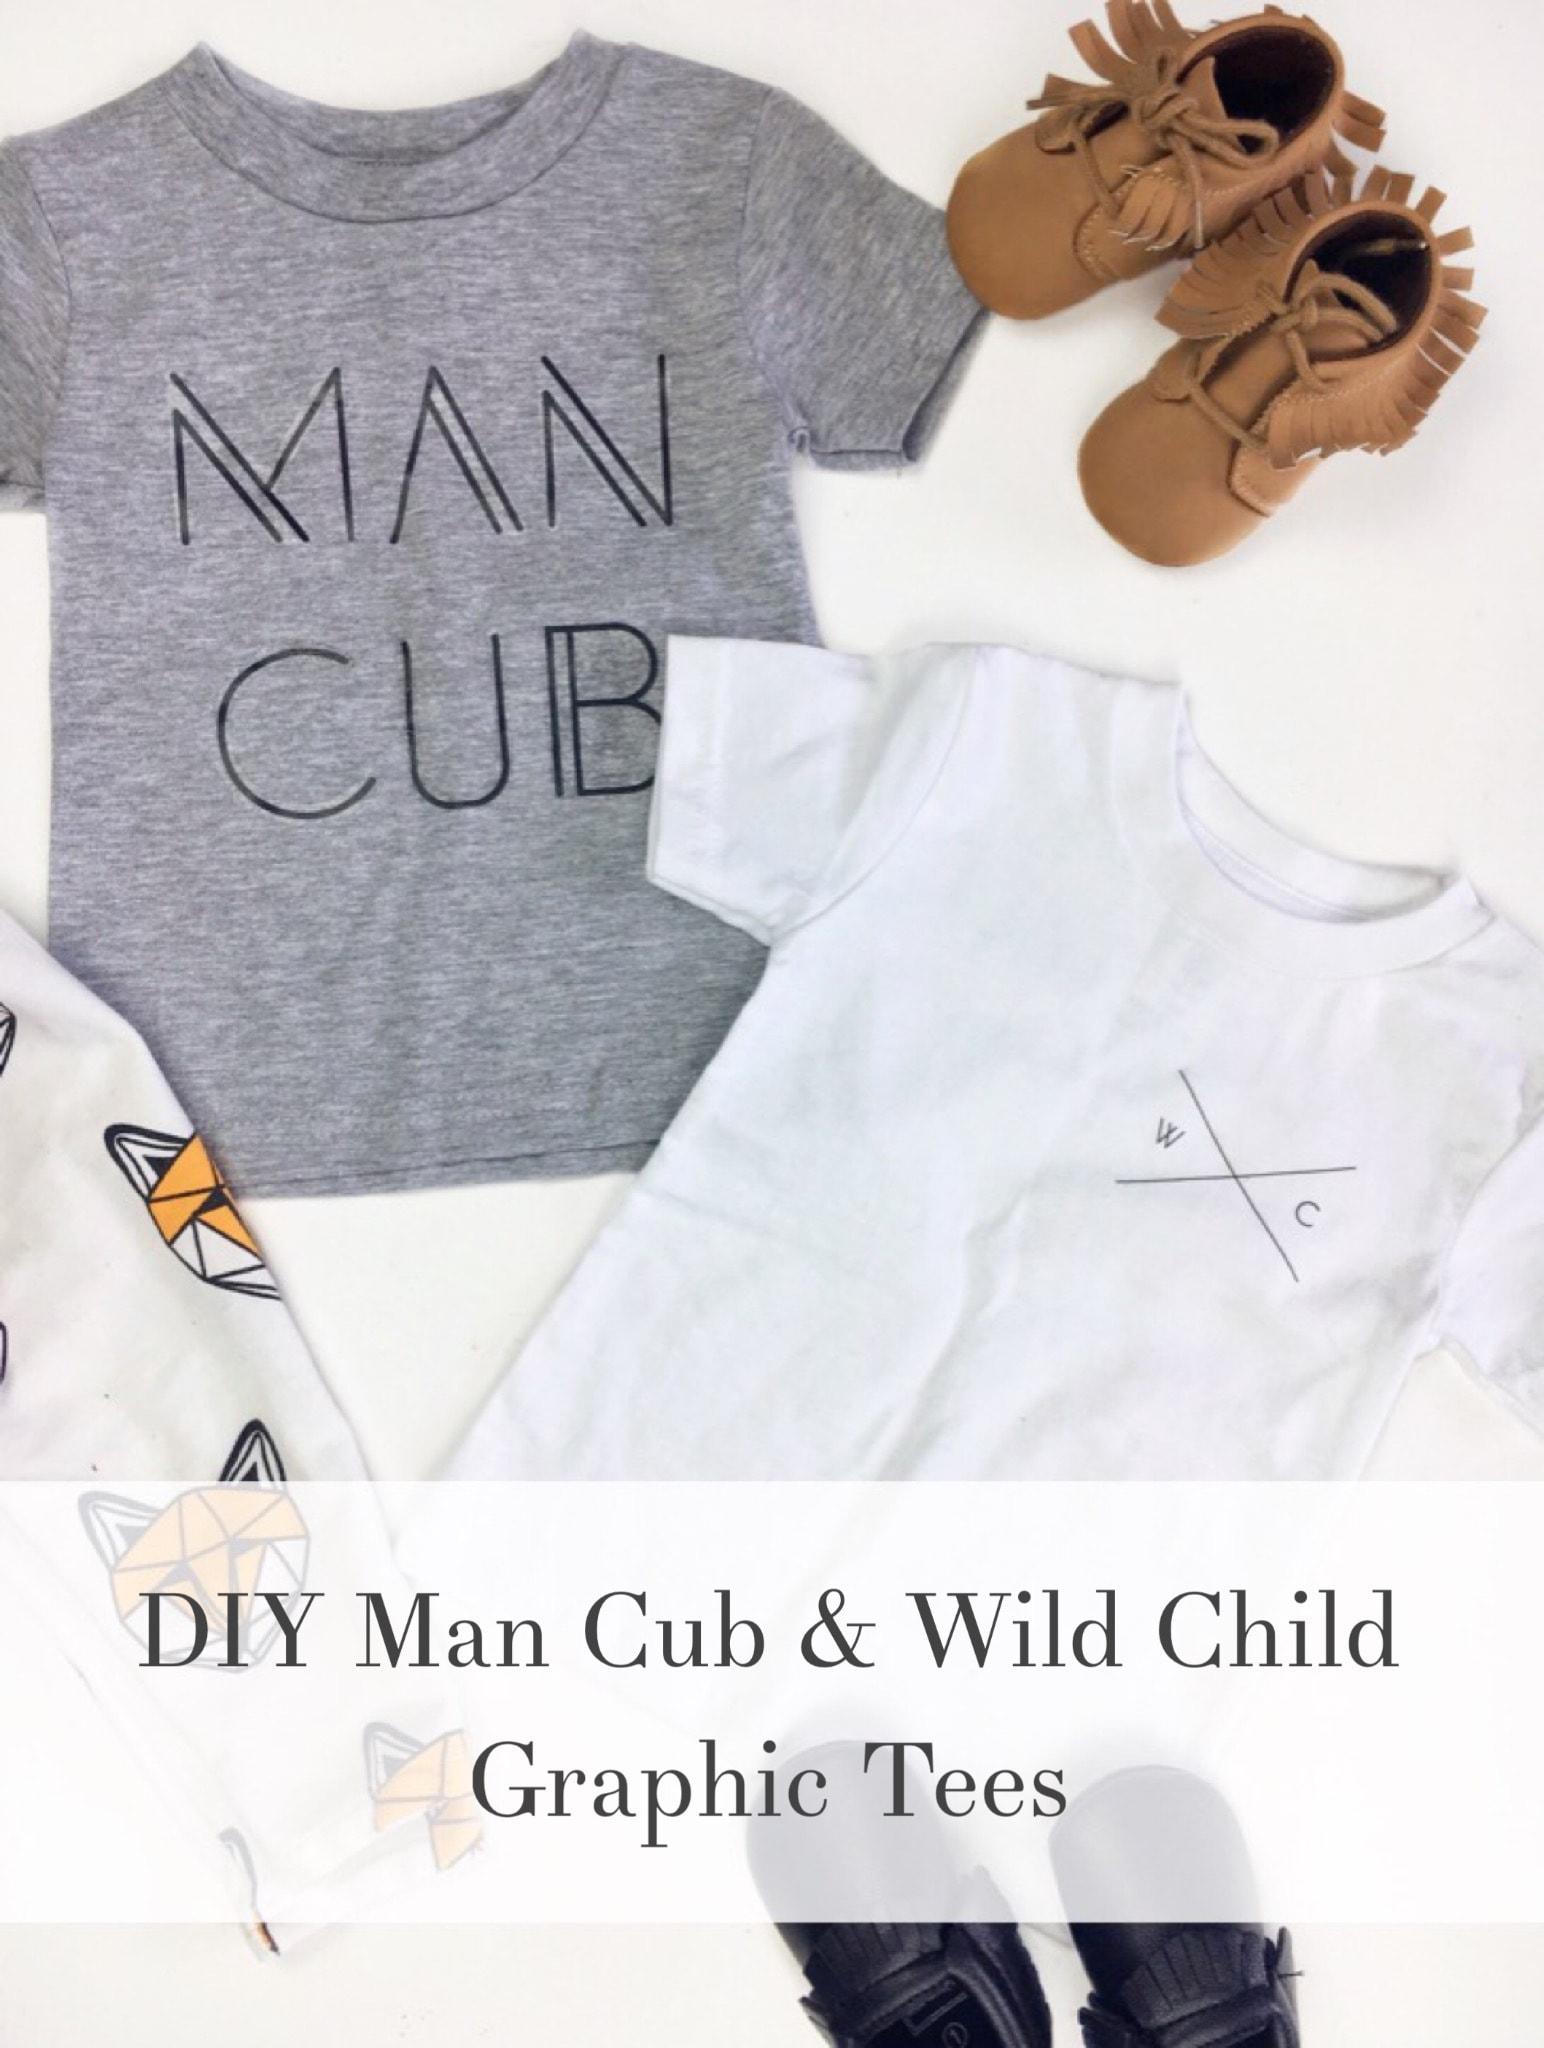 DIY Man Cub & Wild Child Graphic Tees w/ Free Printable Graphics